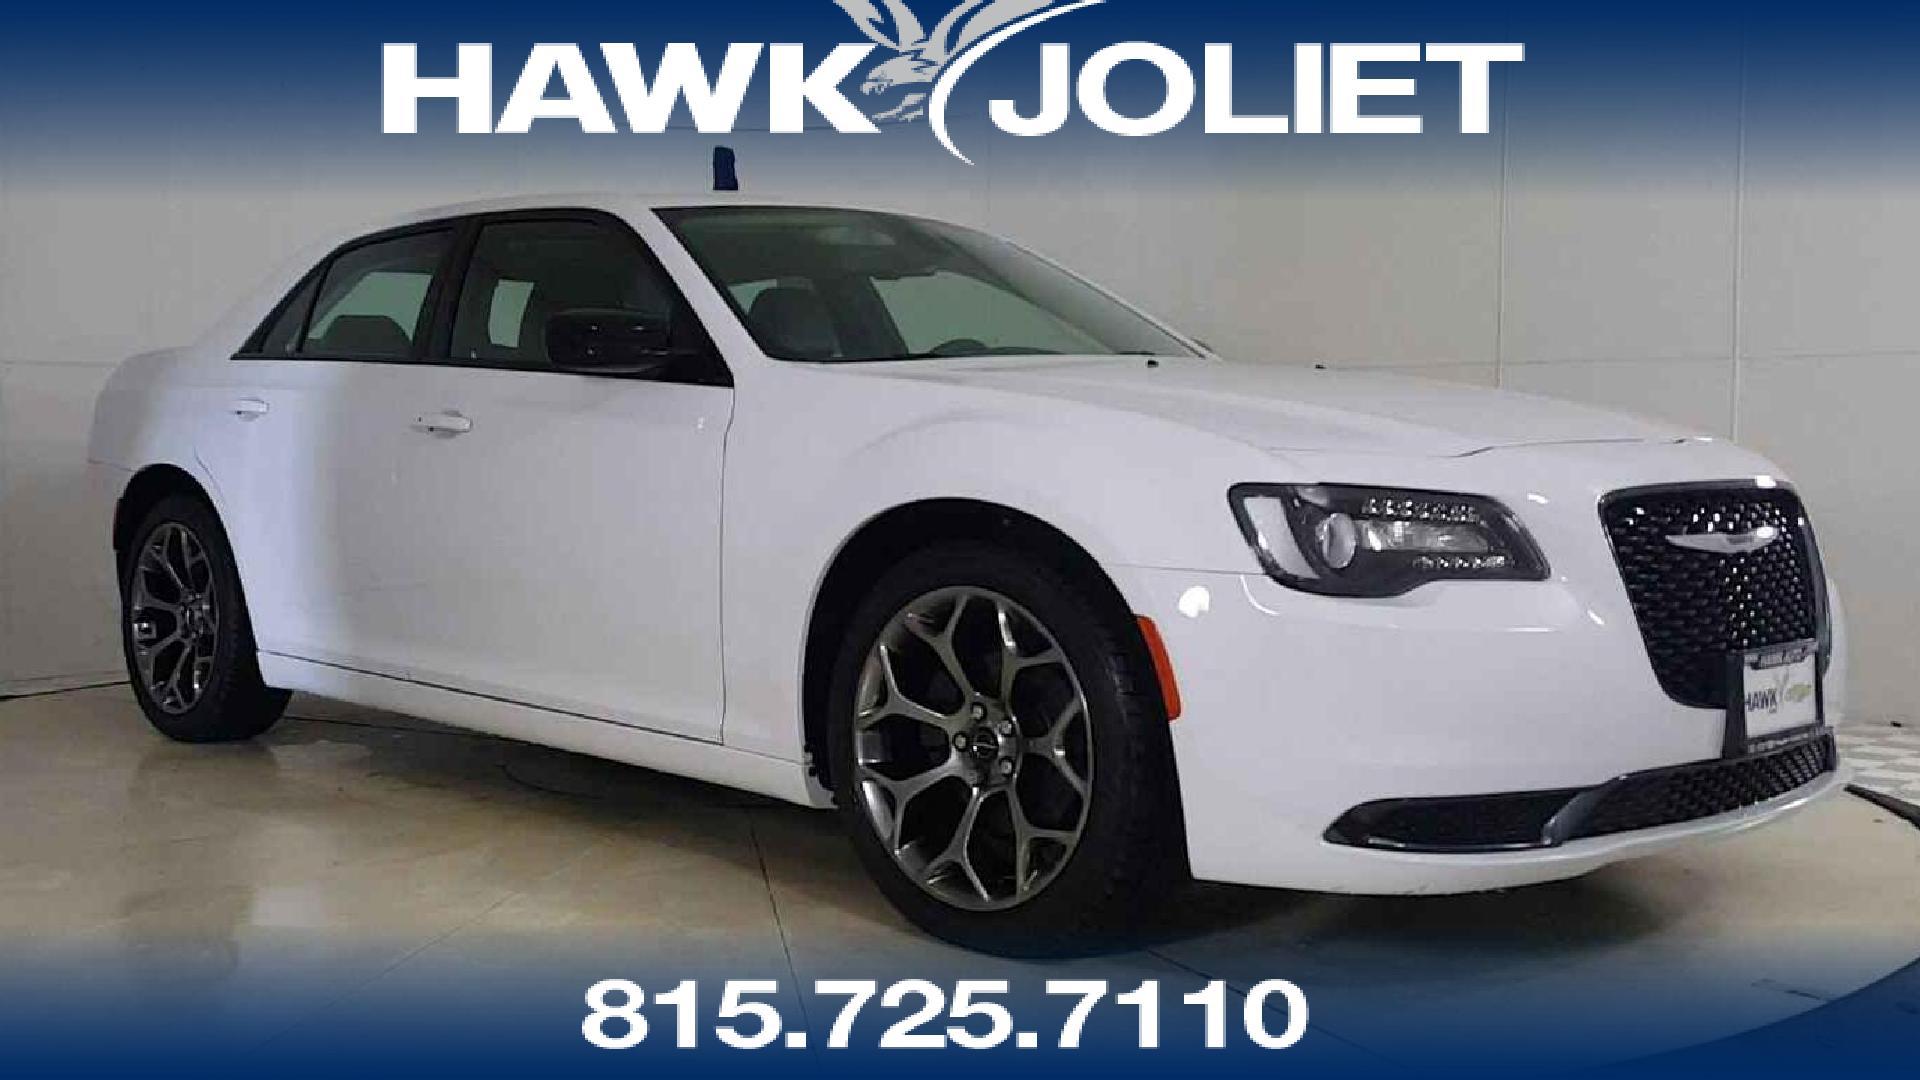 2018 Chrysler 300 for sale in Joliet - 2C3CCAAG4JH341103 - Hawk